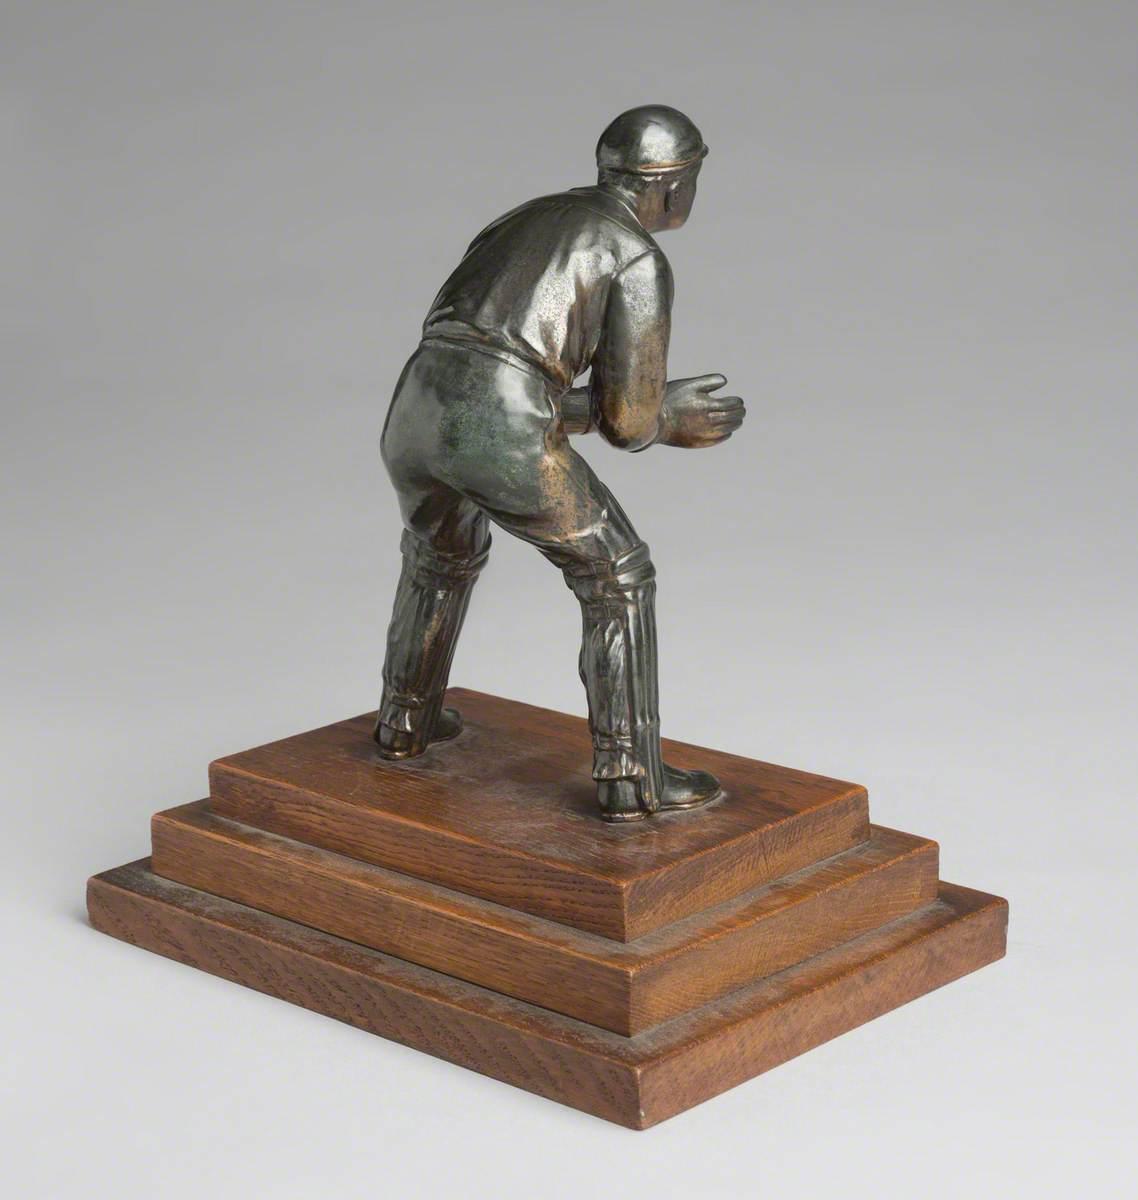 Cricketer, Wicket Keeper